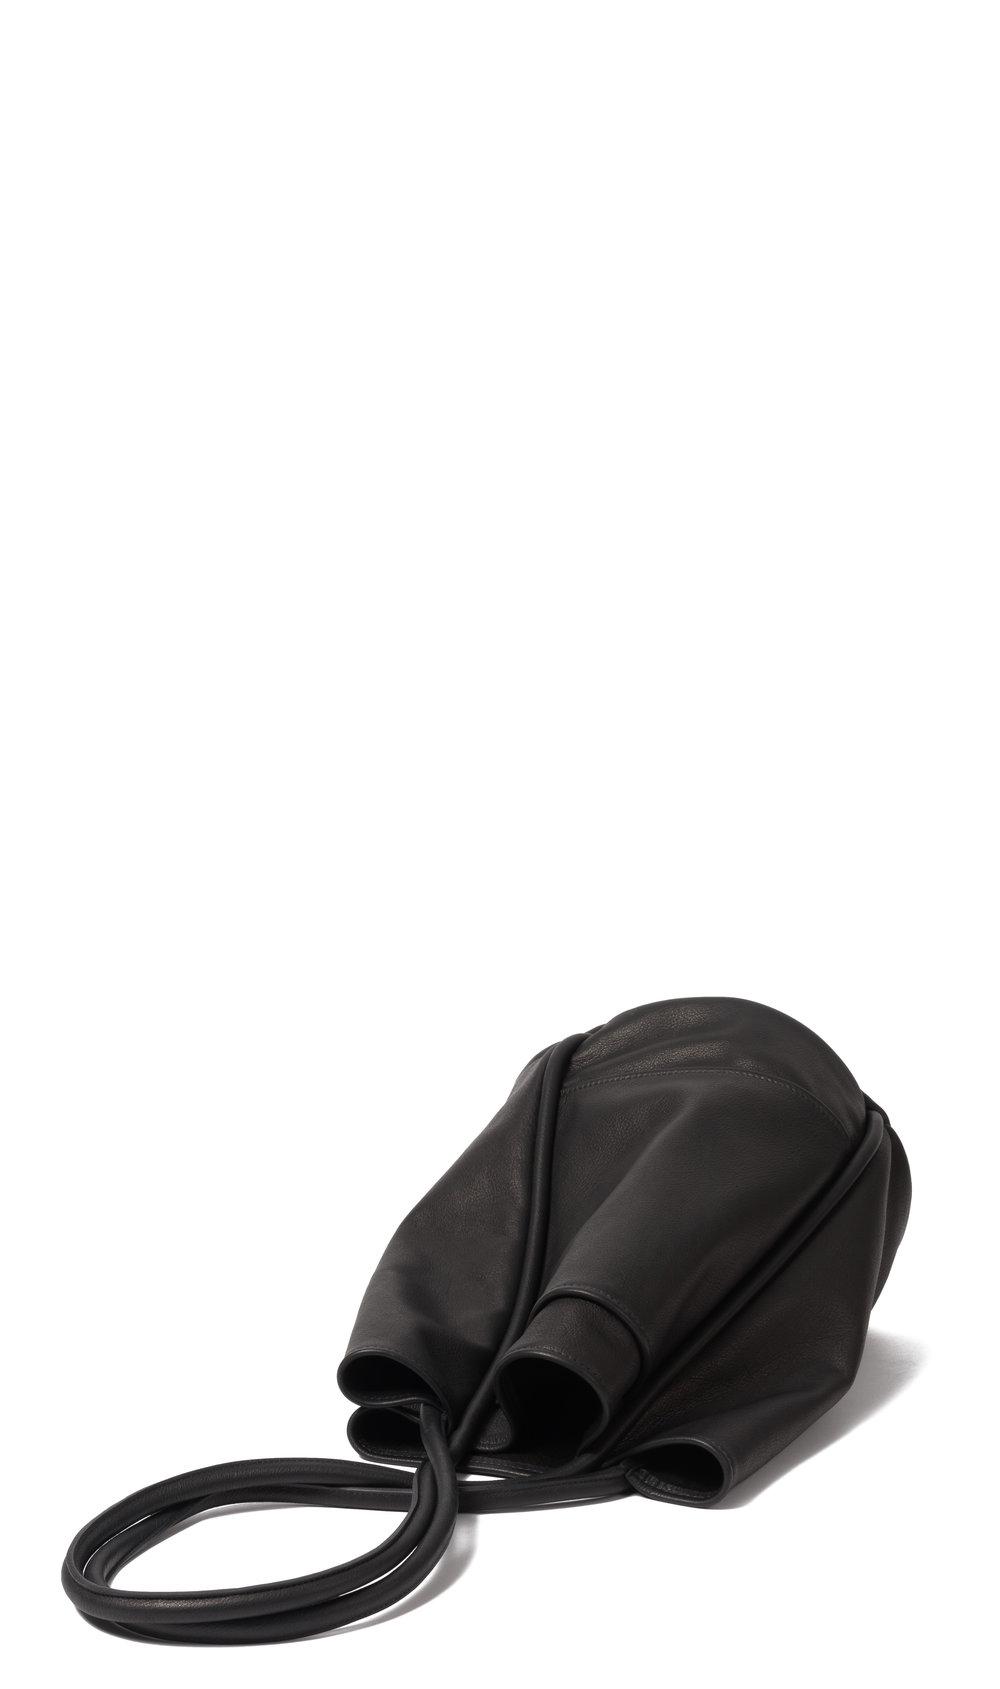 mhfw18_silhouette_black.jpg